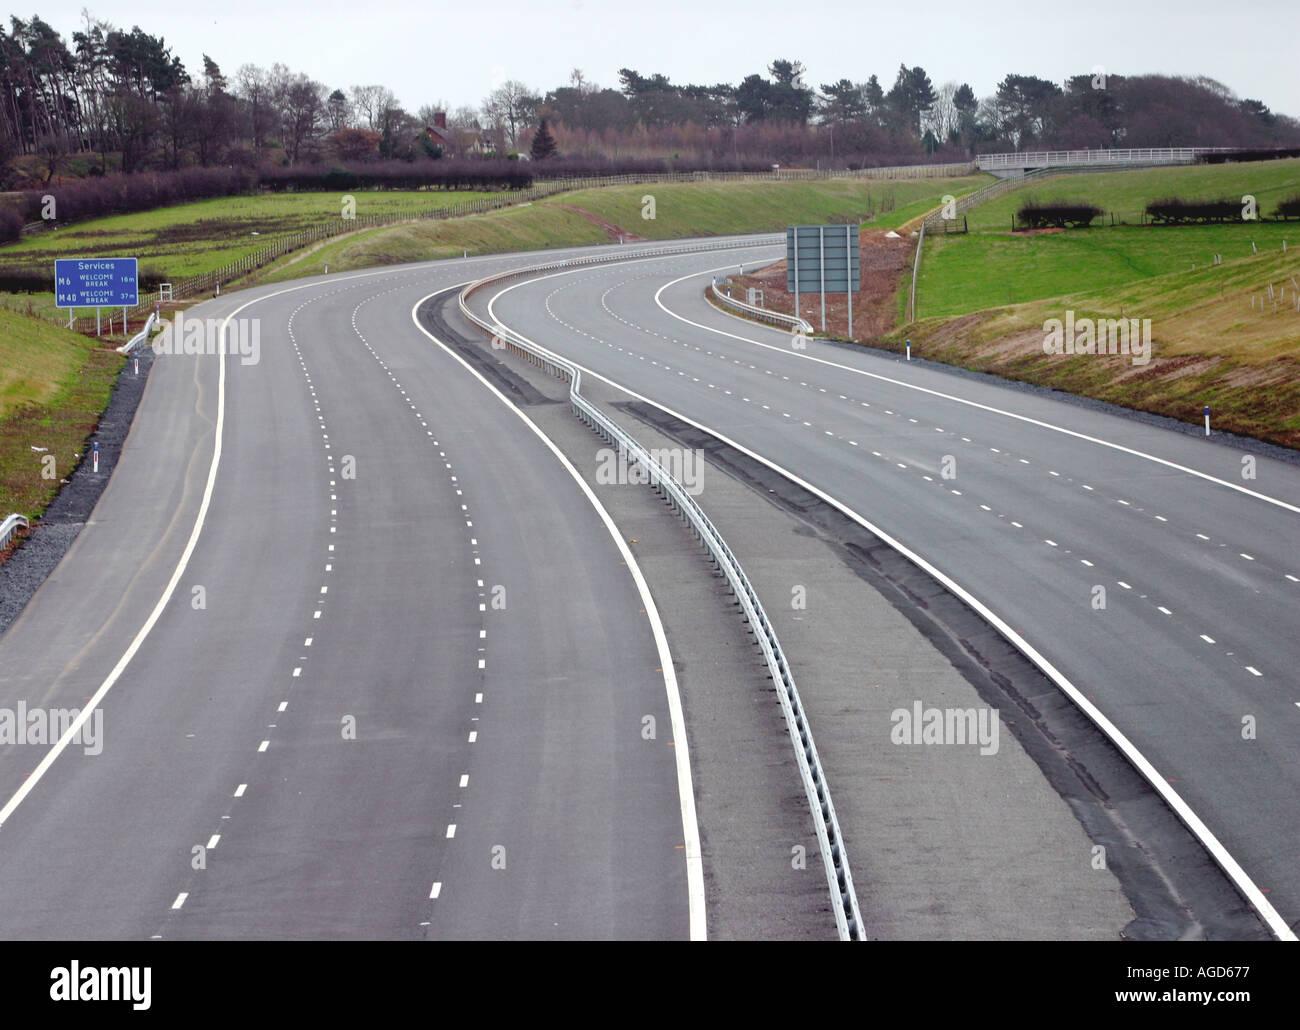 Empty motorway, no traffic. M6 toll road motorway, empty of traffic. - Stock Image